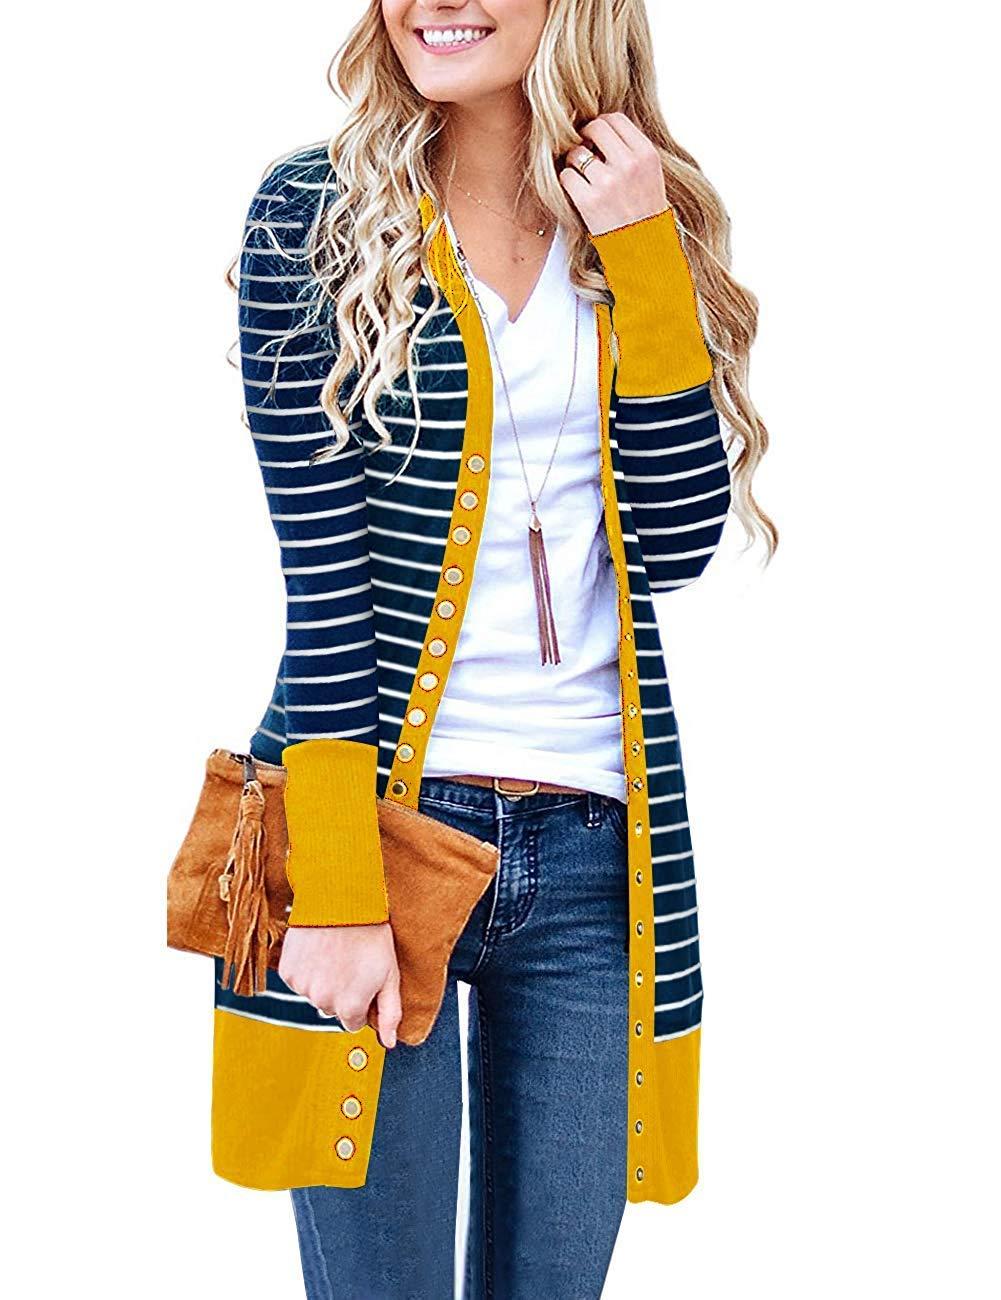 Basic Faith Women's S-3XL V-Neck Button Down Knitwear Long Sleeve Soft Knit Casual Cardigan Sweater Stripe Mustard L